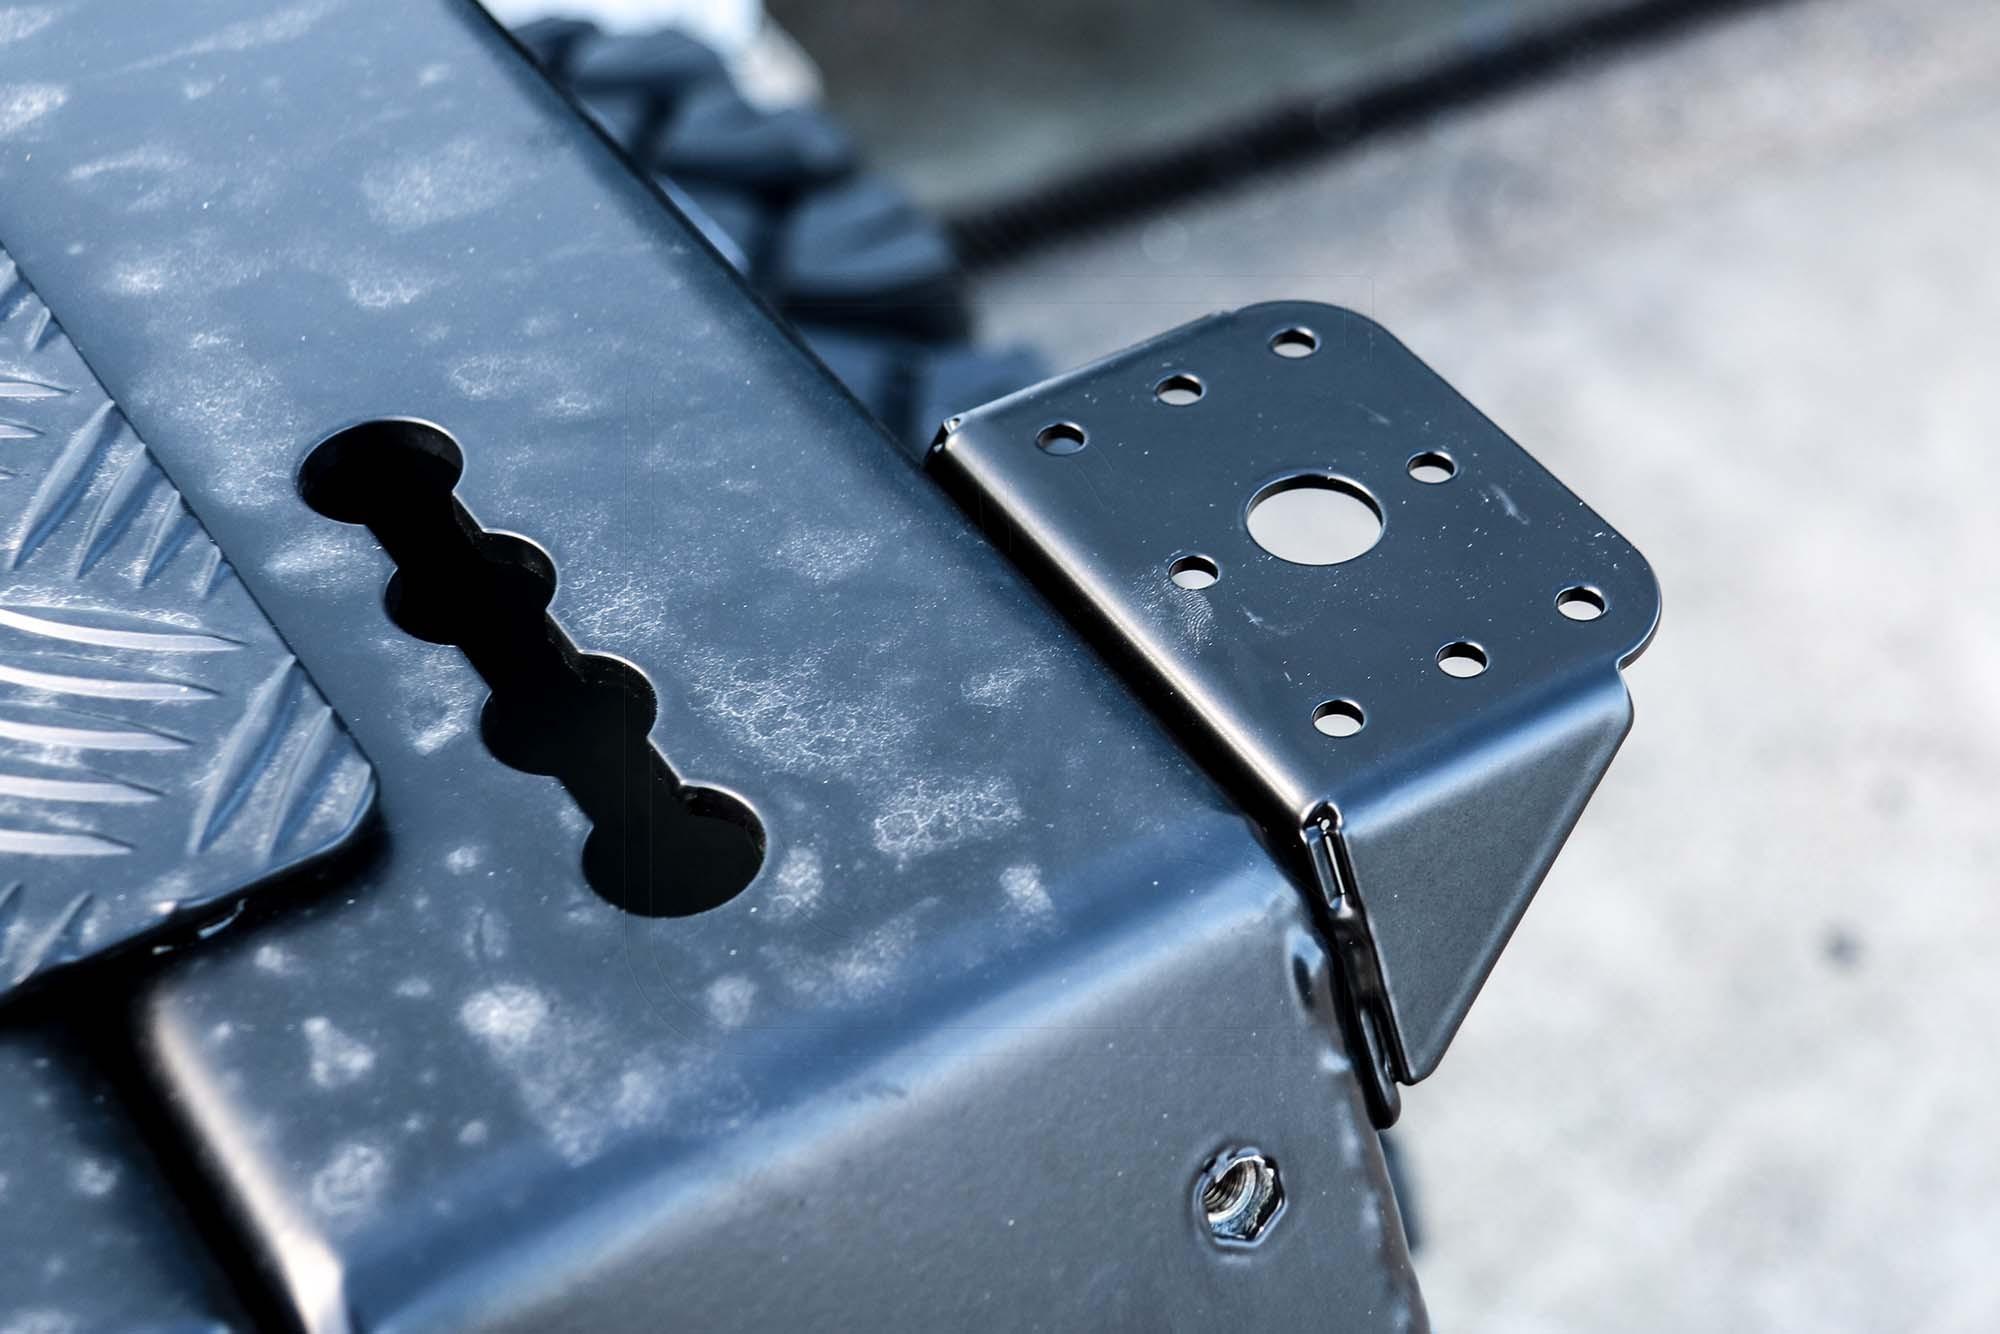 CargoBear Auxiliary / Worklight Bracket (EACH BRACKET SOLD INDIVIDUALLY)